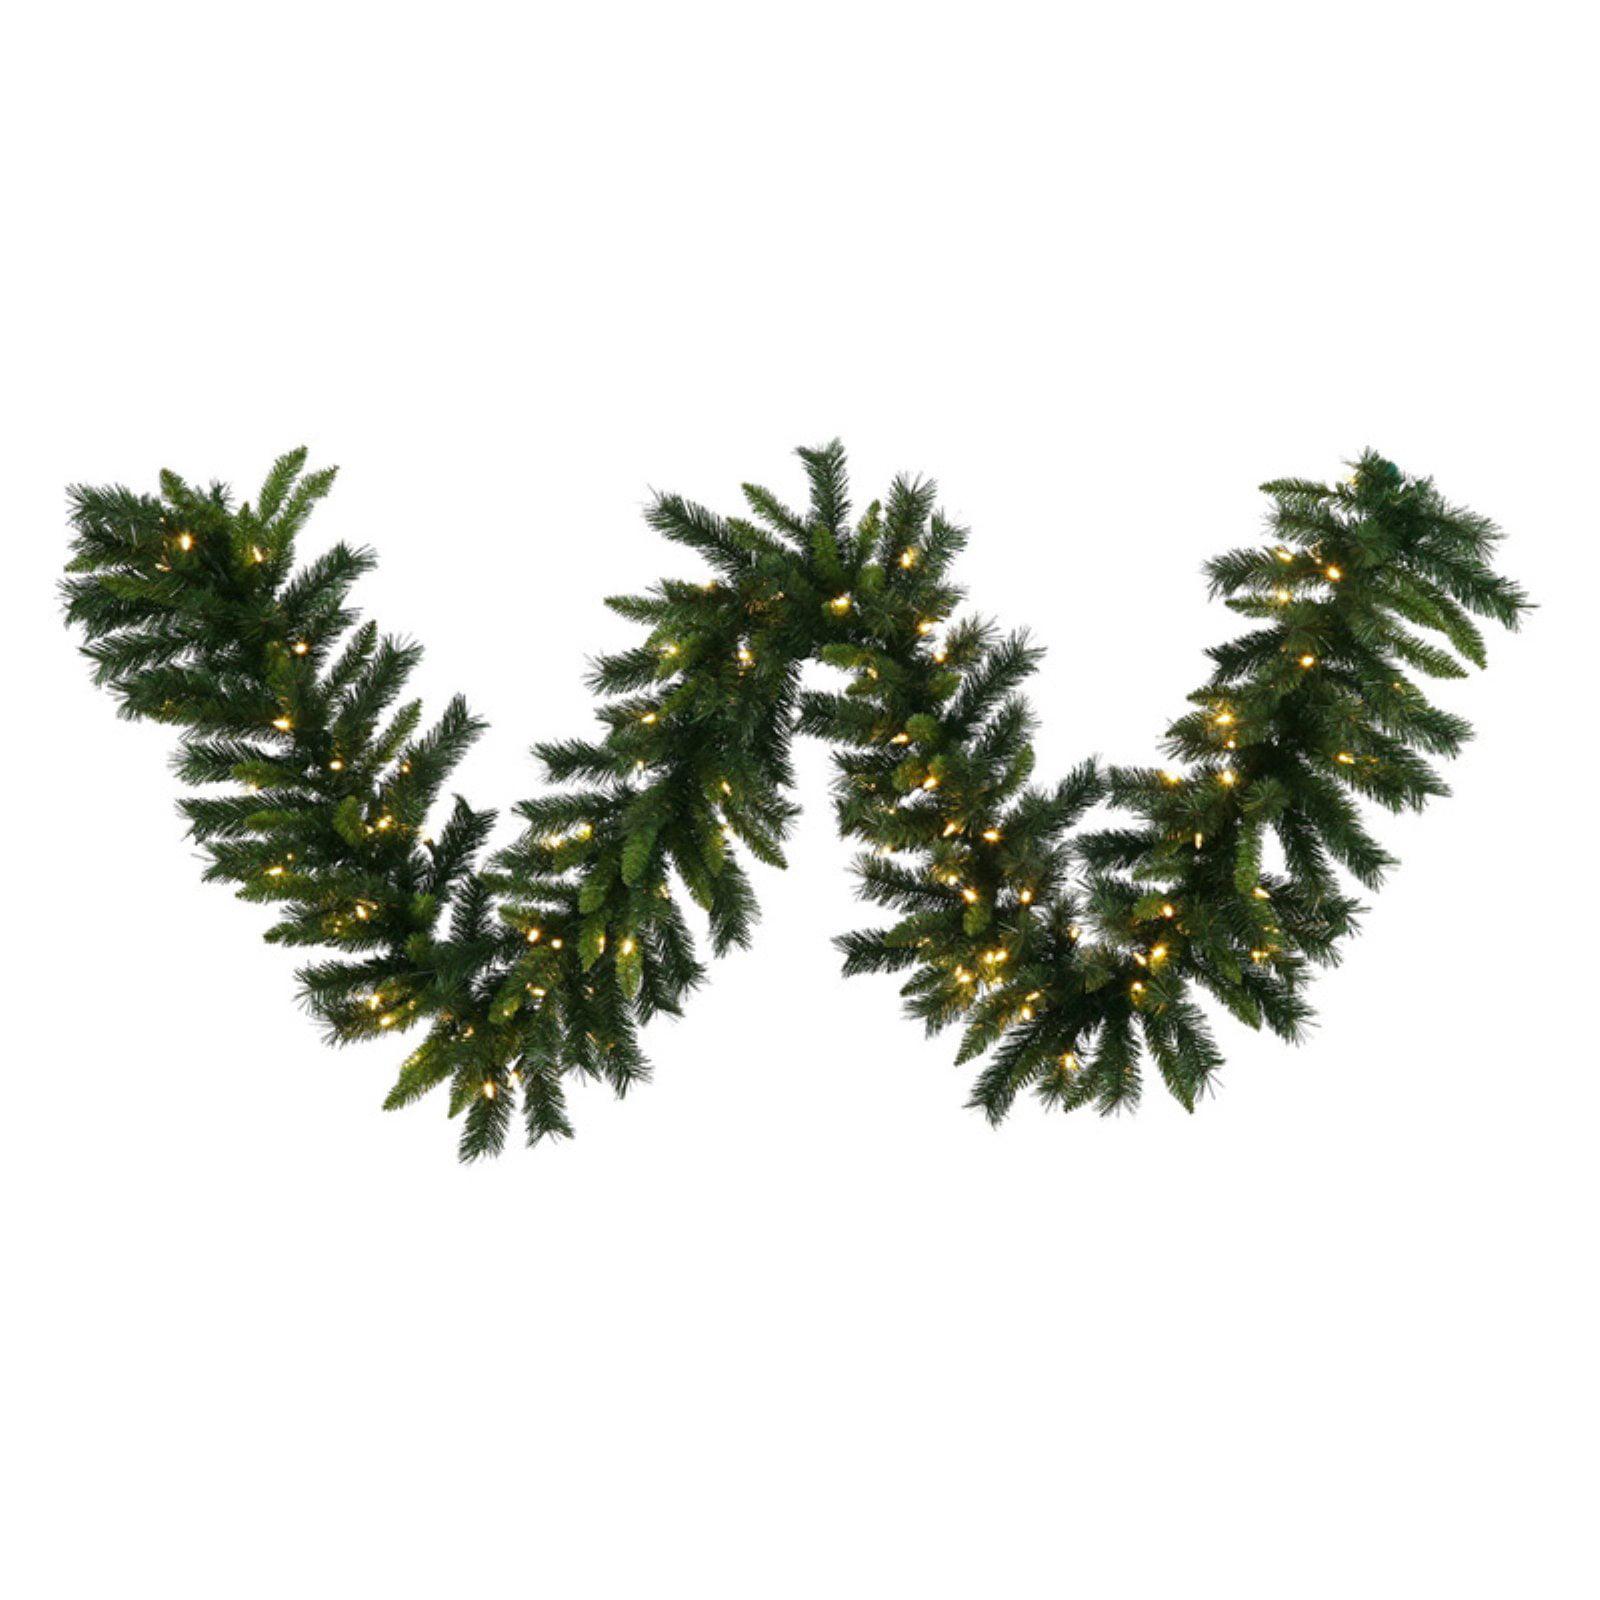 Vickerman Imperial Pine Pre-Lit LED Garland - Warm White Italian Lights